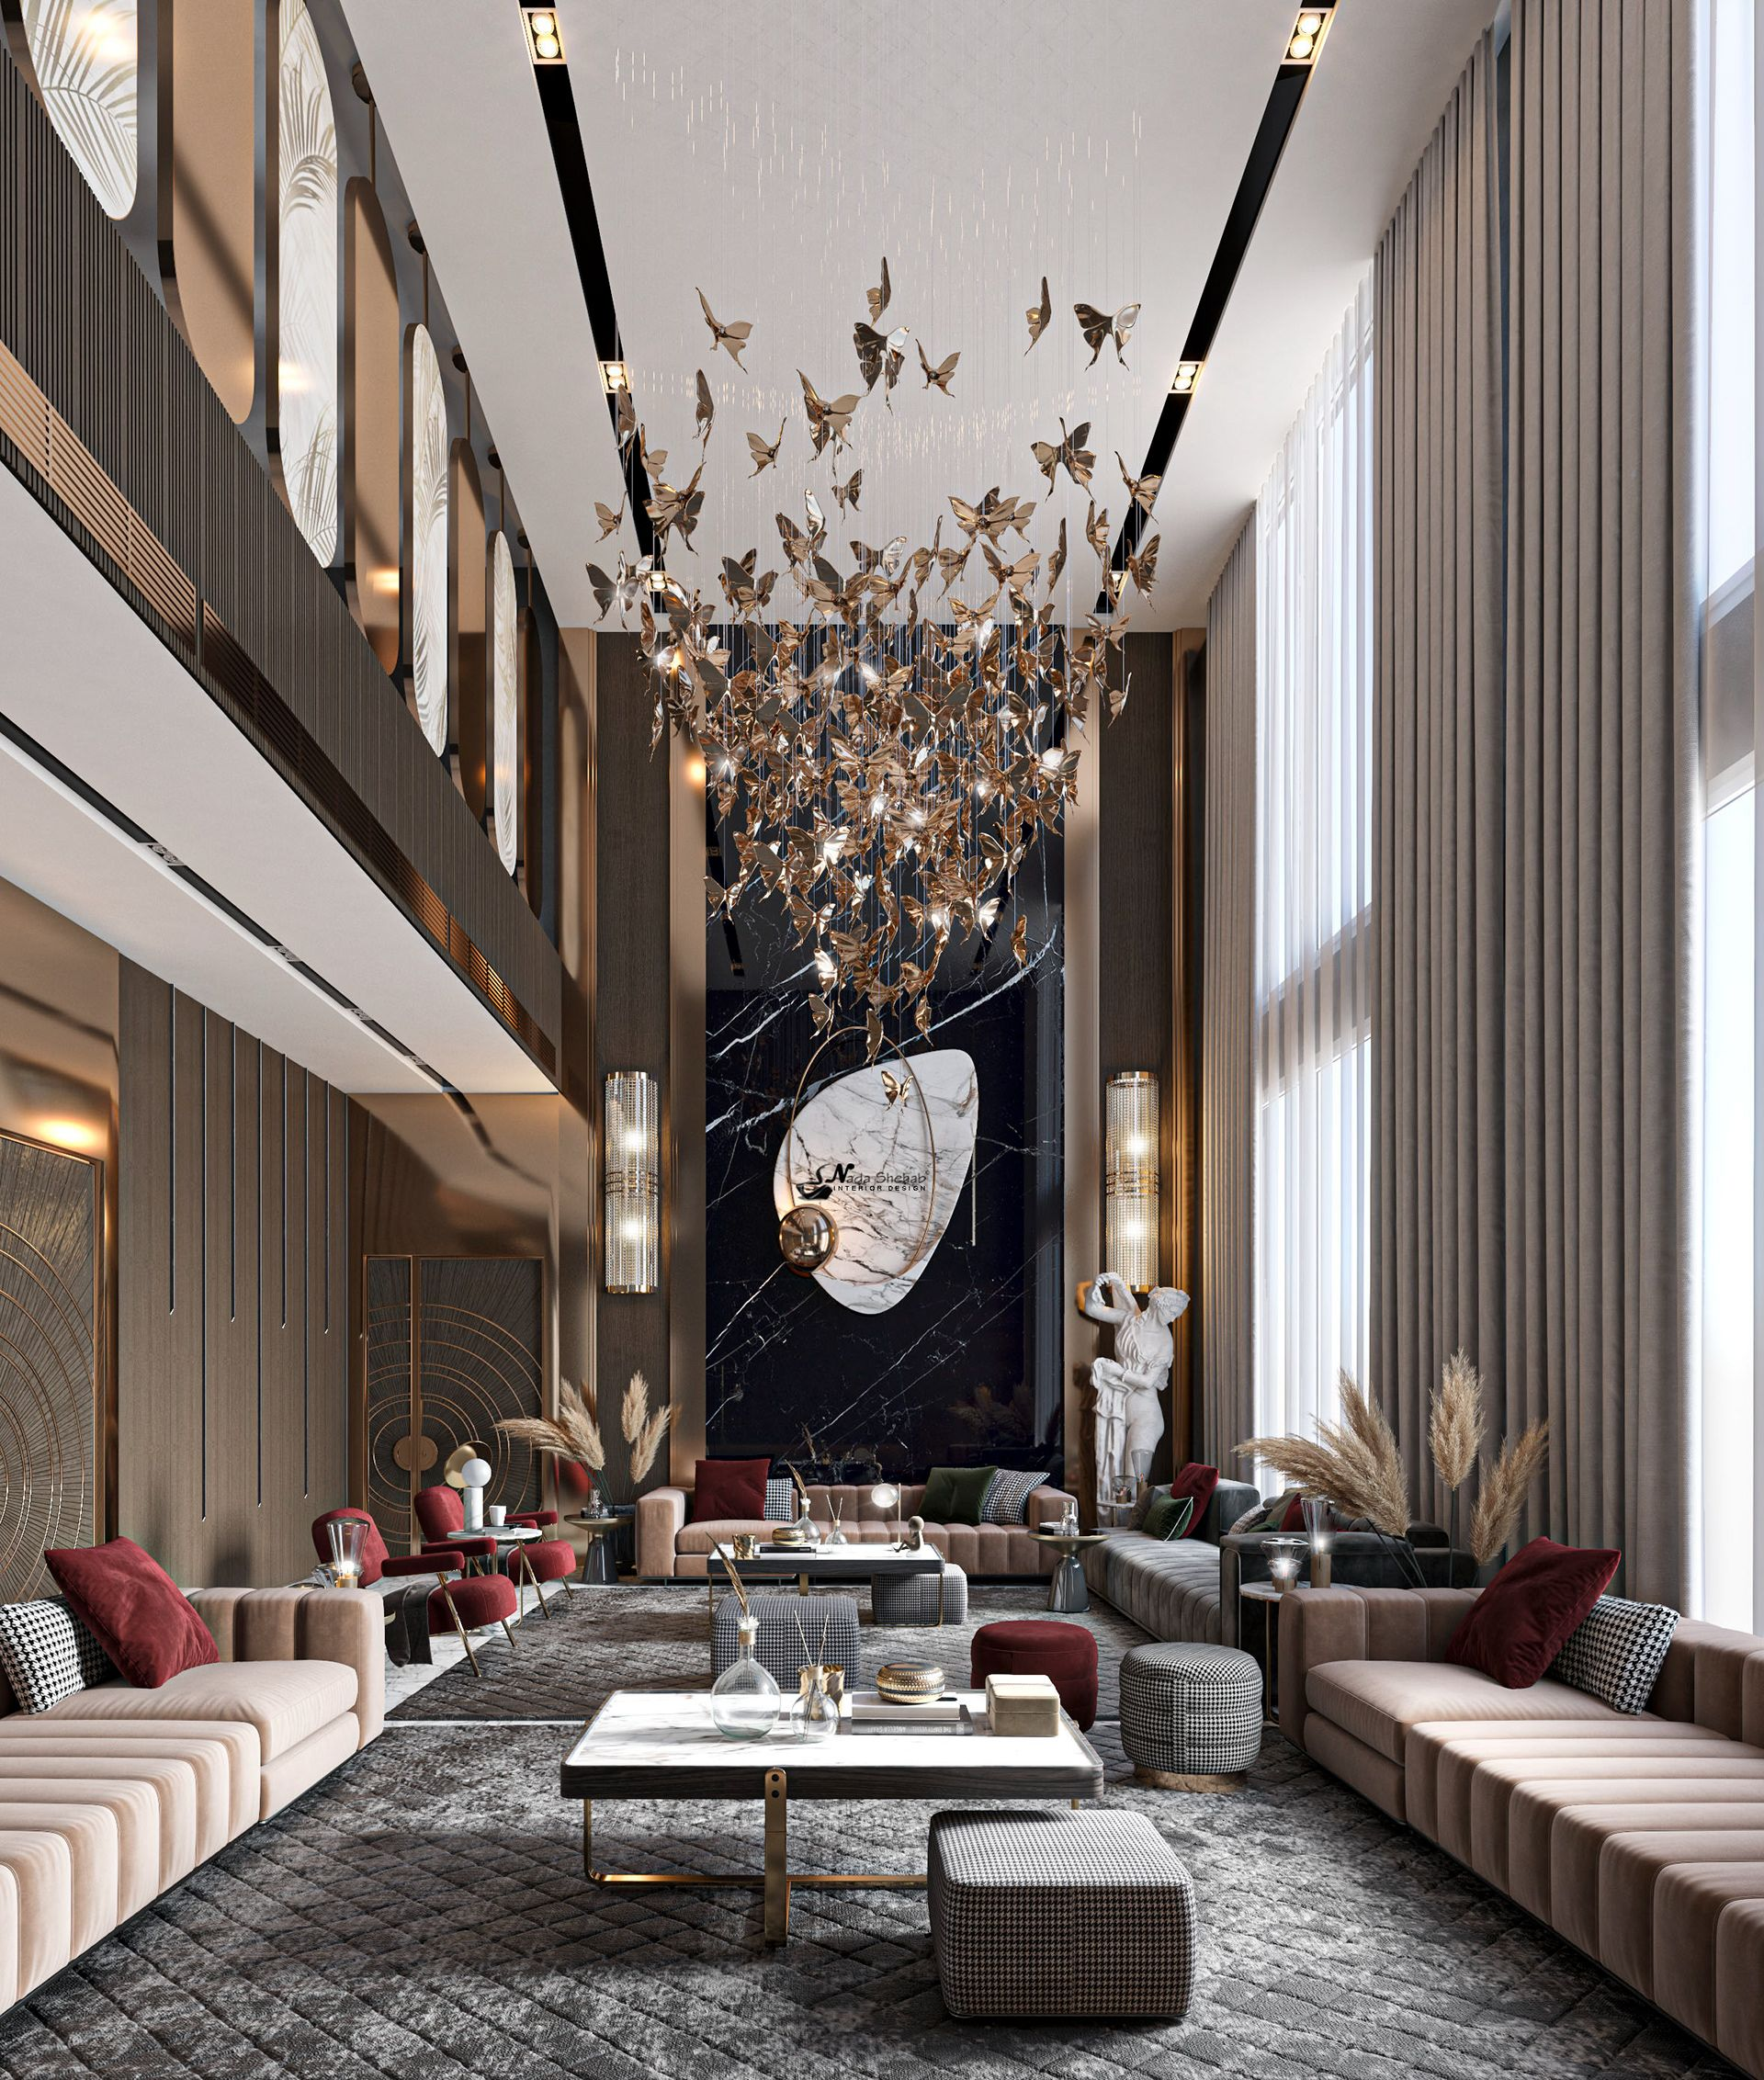 Luxury Double Height On Behance Interior Rumah Mewah Ide Dekorasi Rumah Ide Apartemen